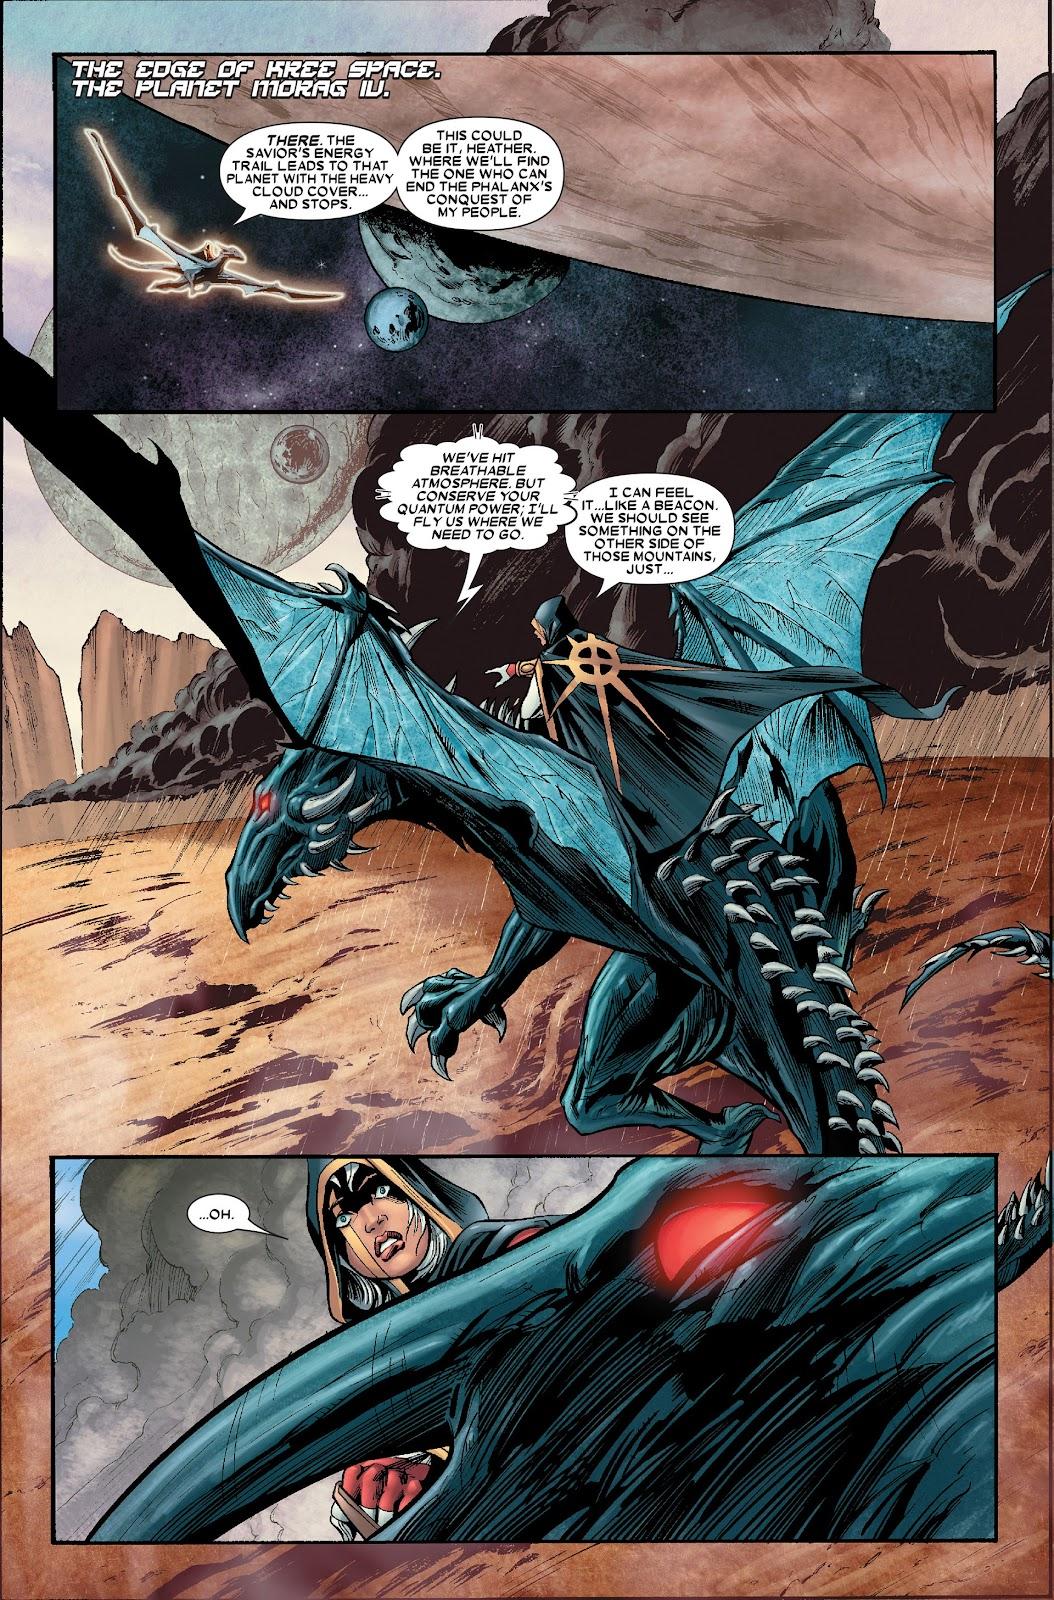 Annihilation: Conquest - Quasar issue 3 - Page 8